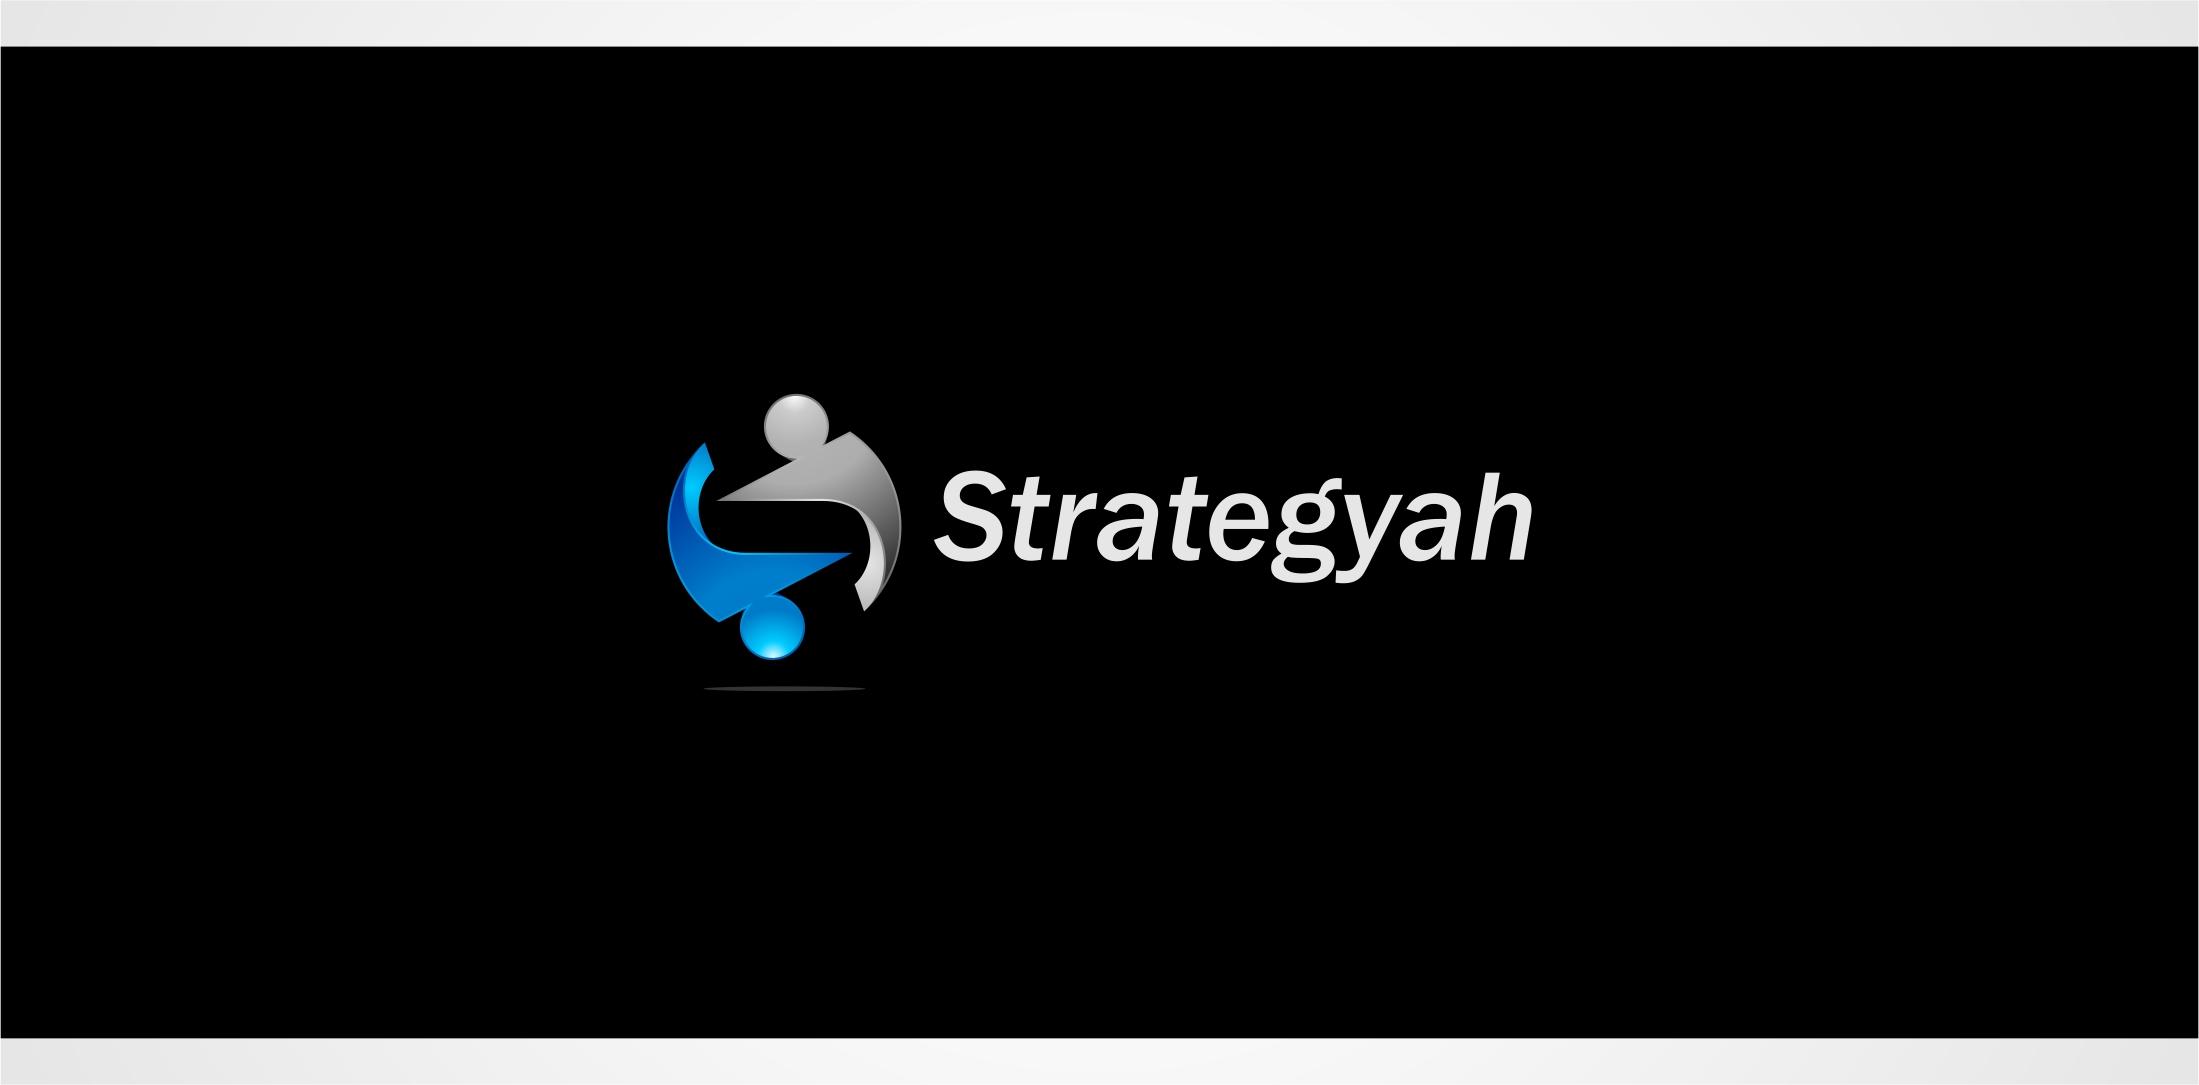 Logo Design by haidu - Entry No. 444 in the Logo Design Contest Creative Logo Design for Strategyah.